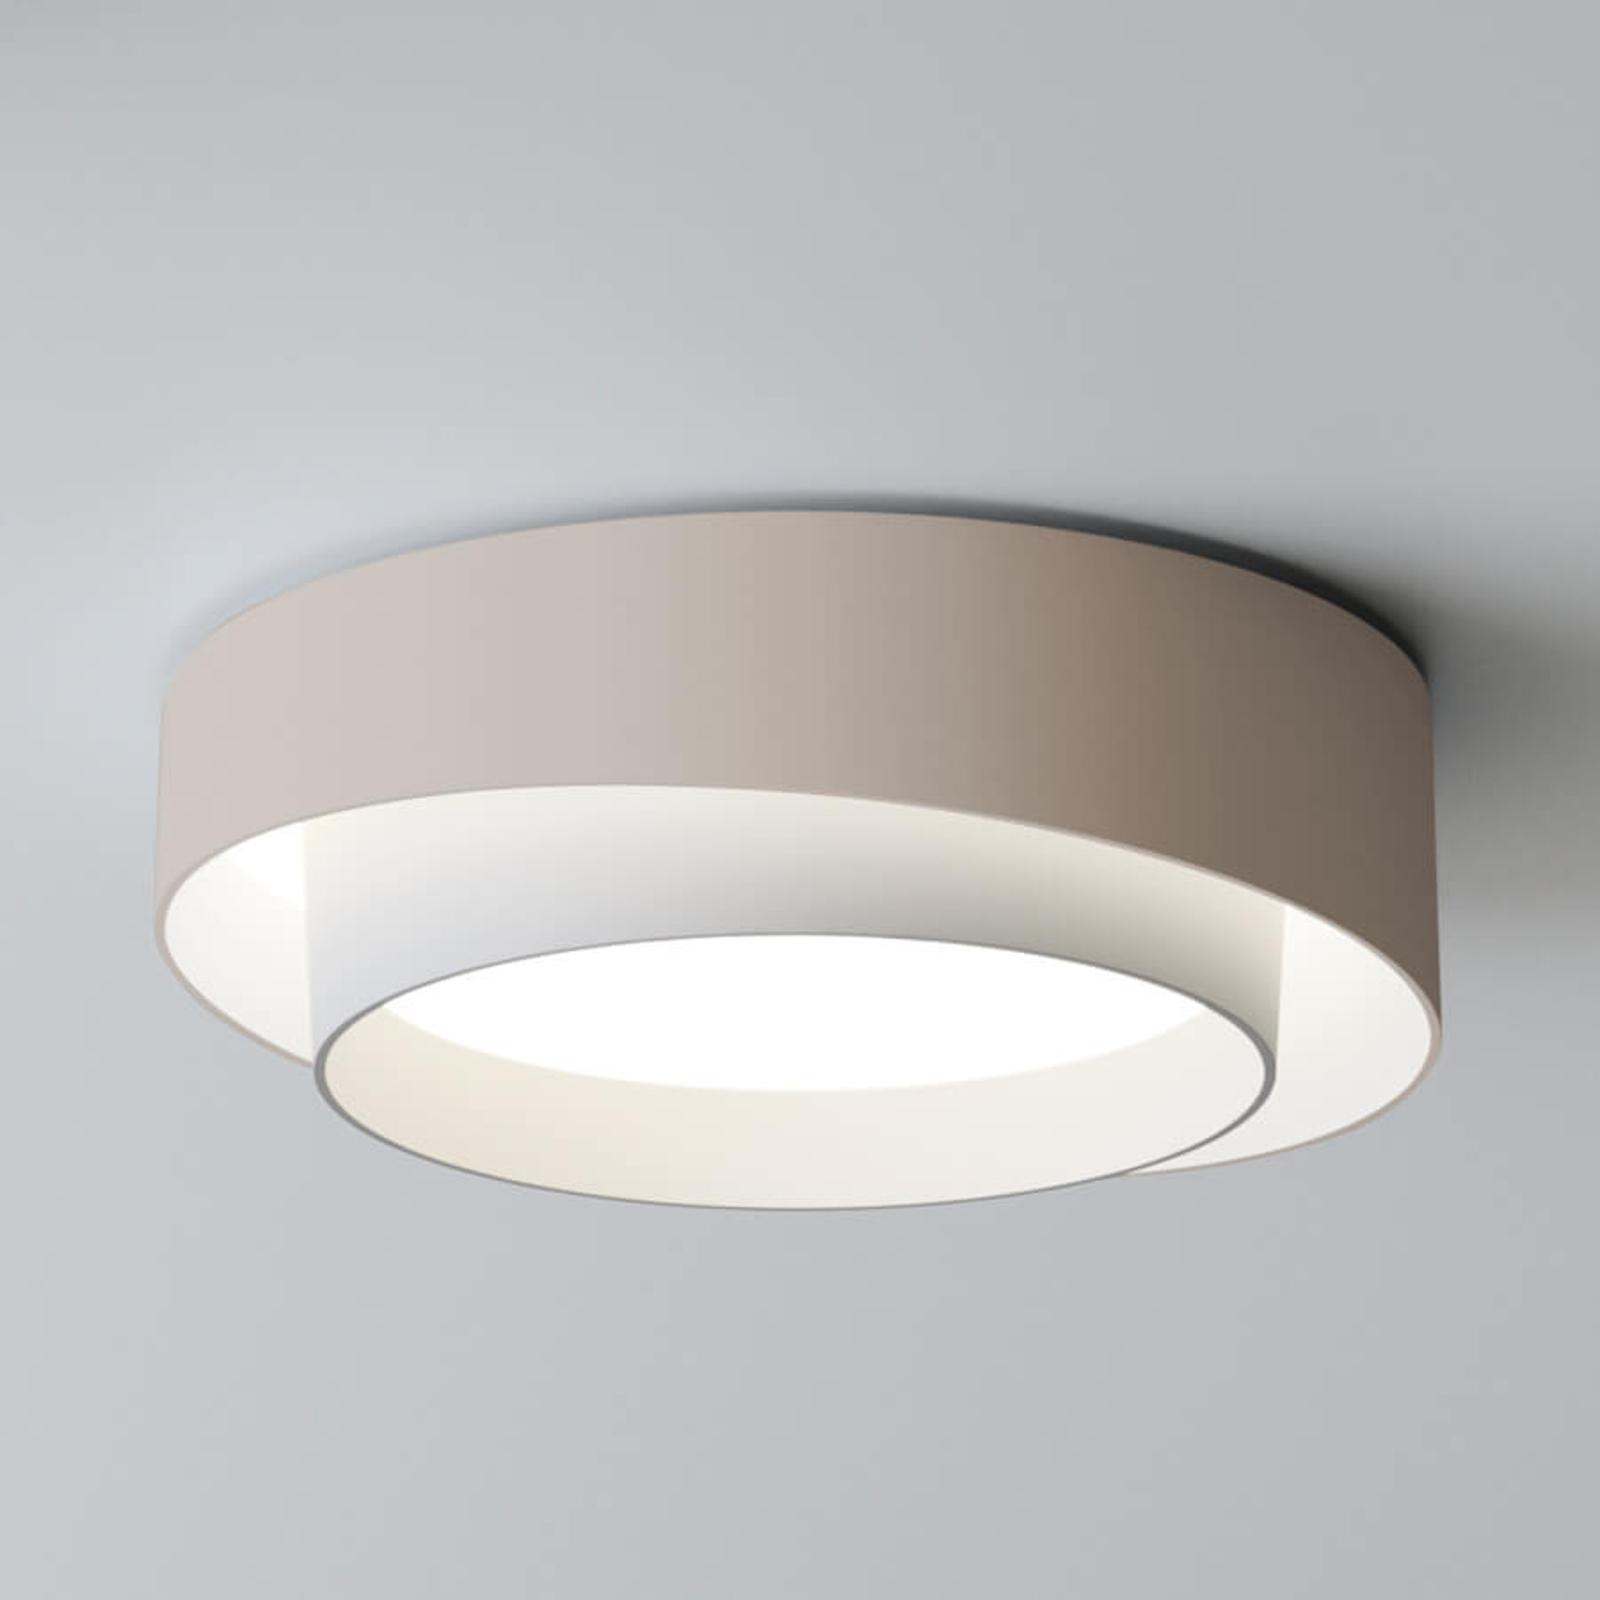 Centric LED-taklampe med god lysstyrke, kremfarget